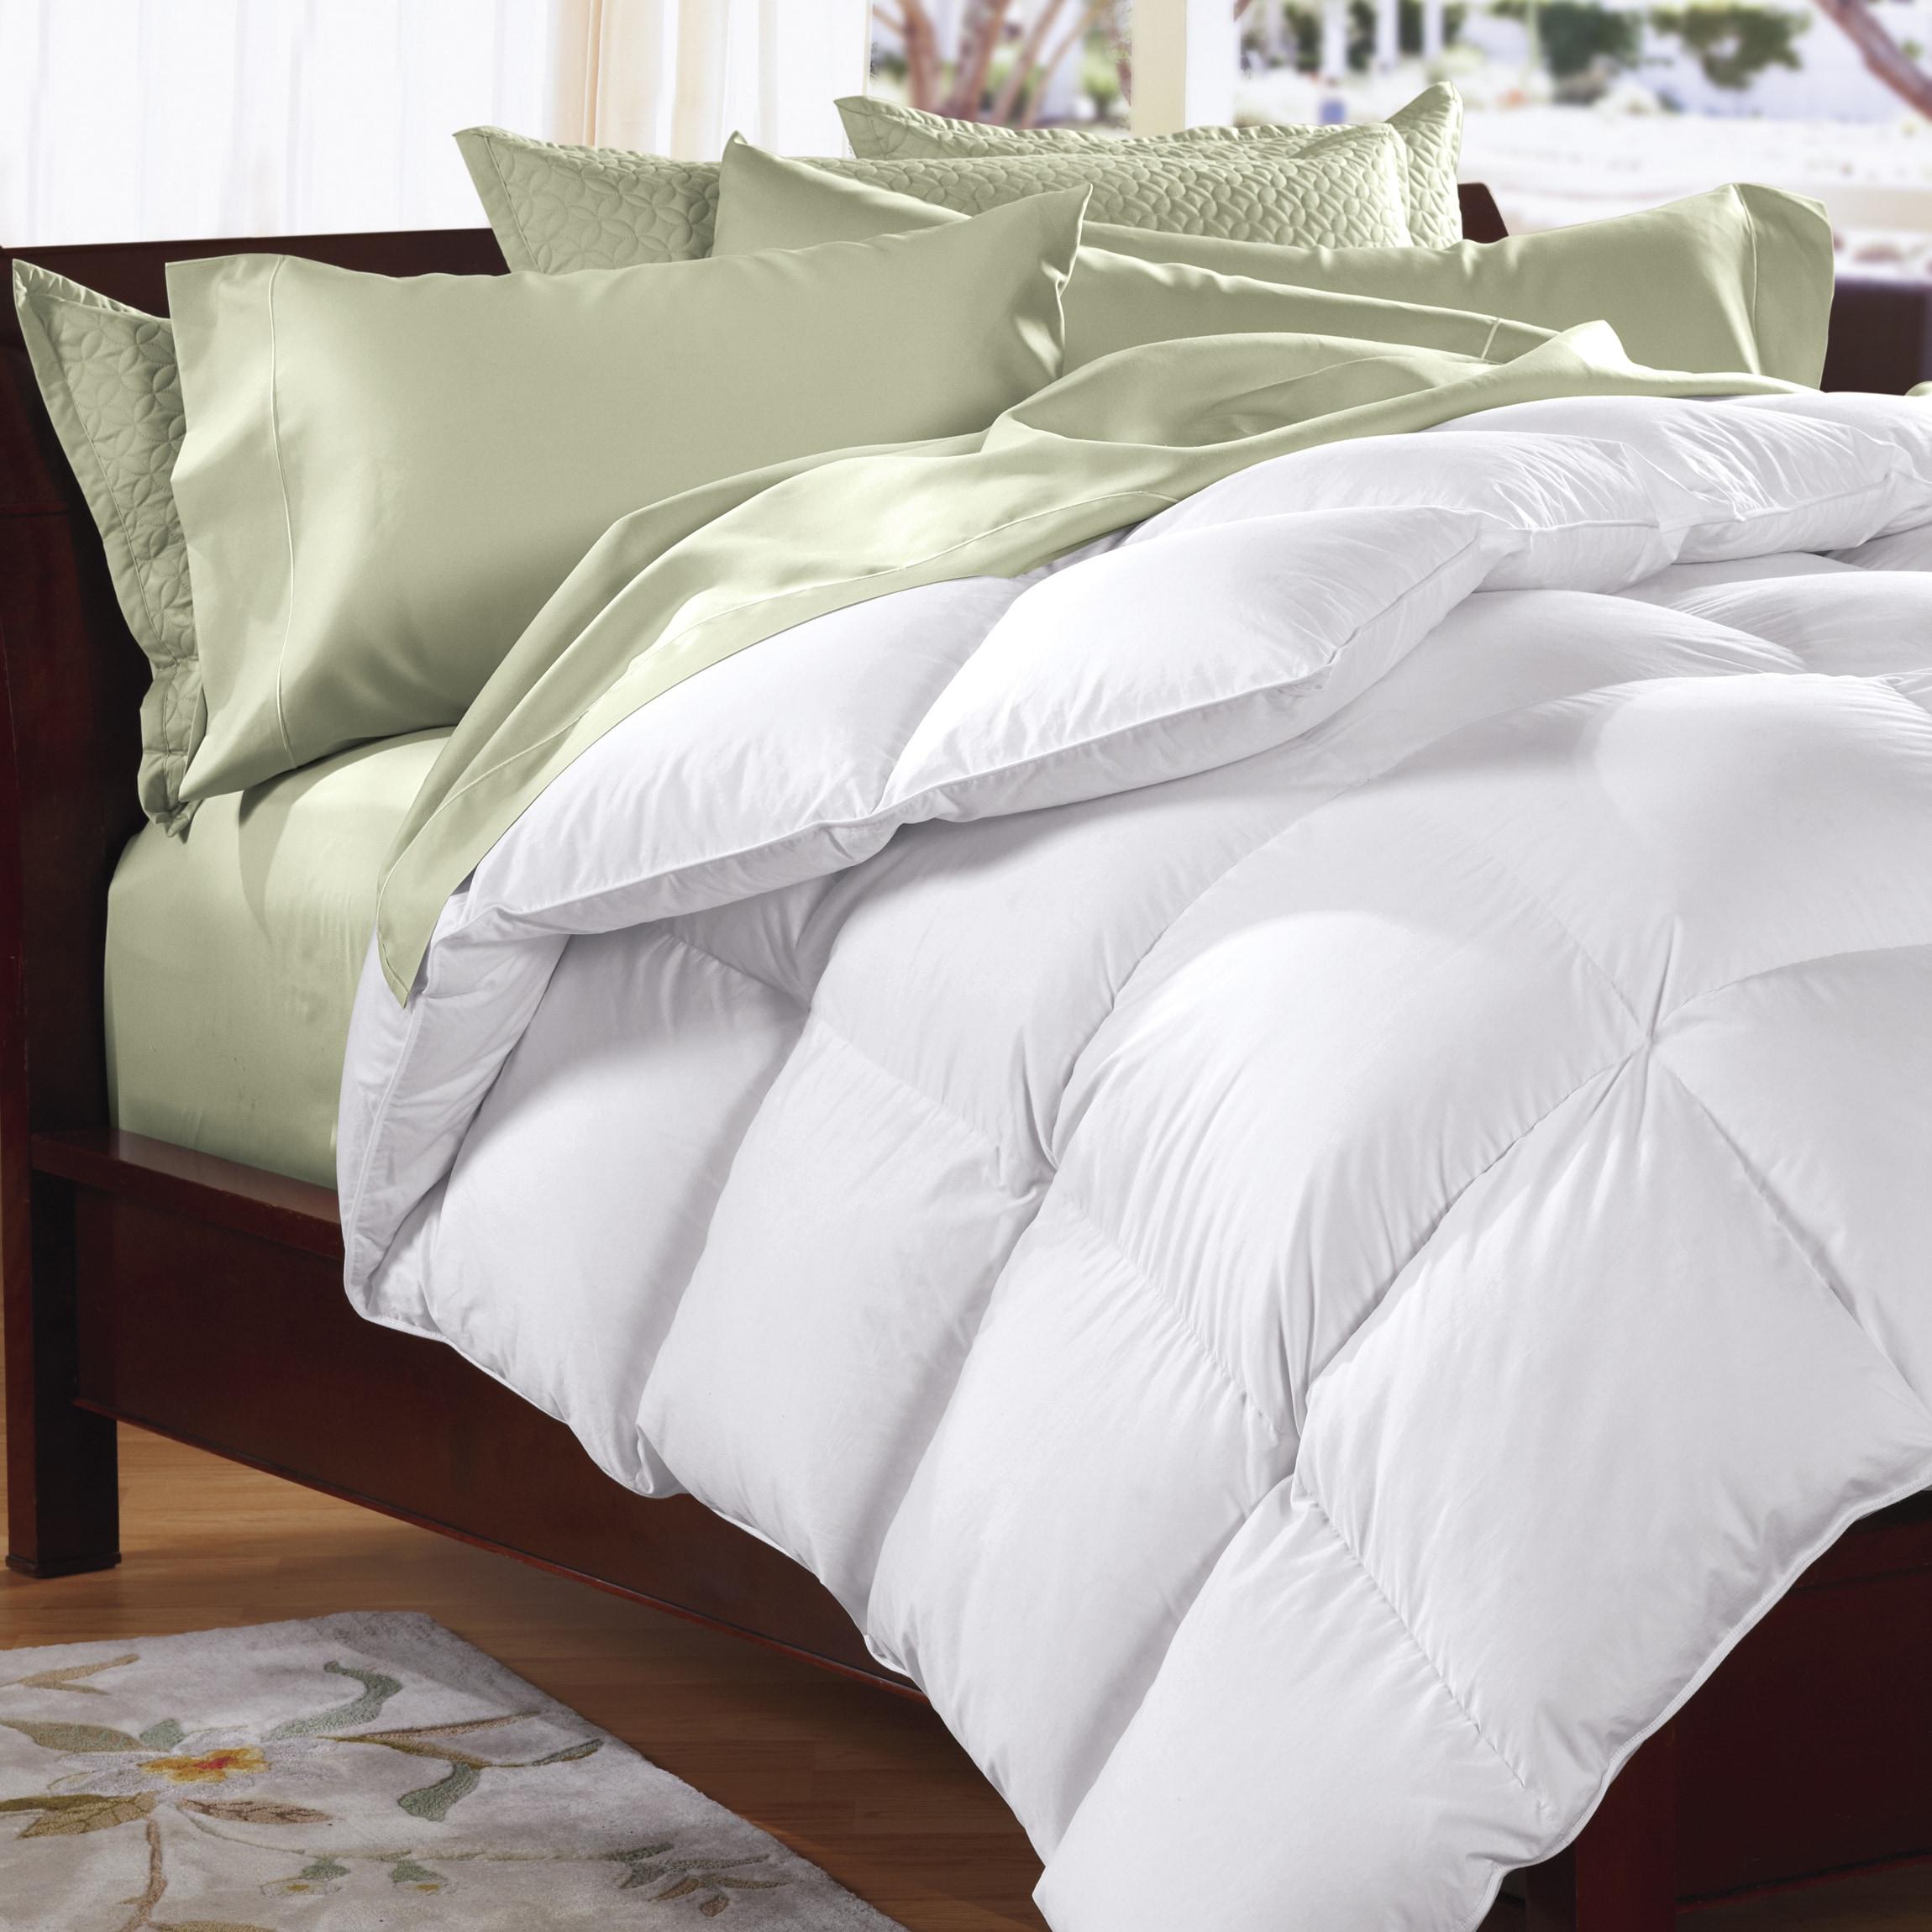 fillers duvet by nuvola bed insert pillow frette medium alternative filler down comforters